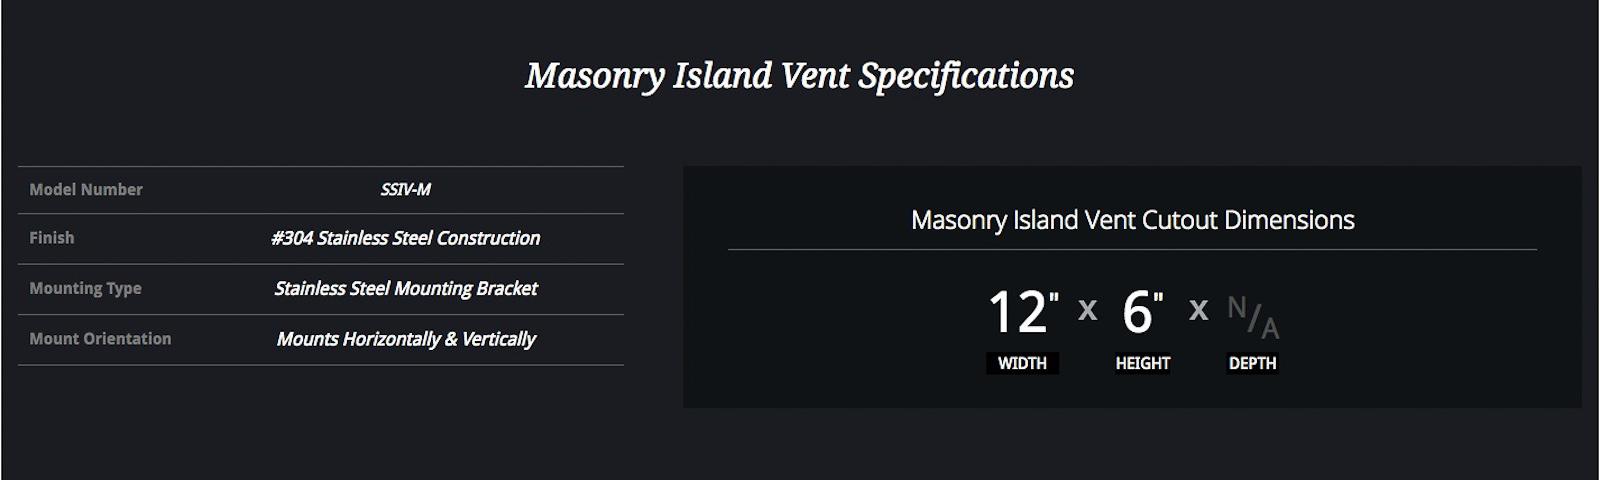 summerset-masonry-island-vent-masonry-flange-ssiv-m.jpg